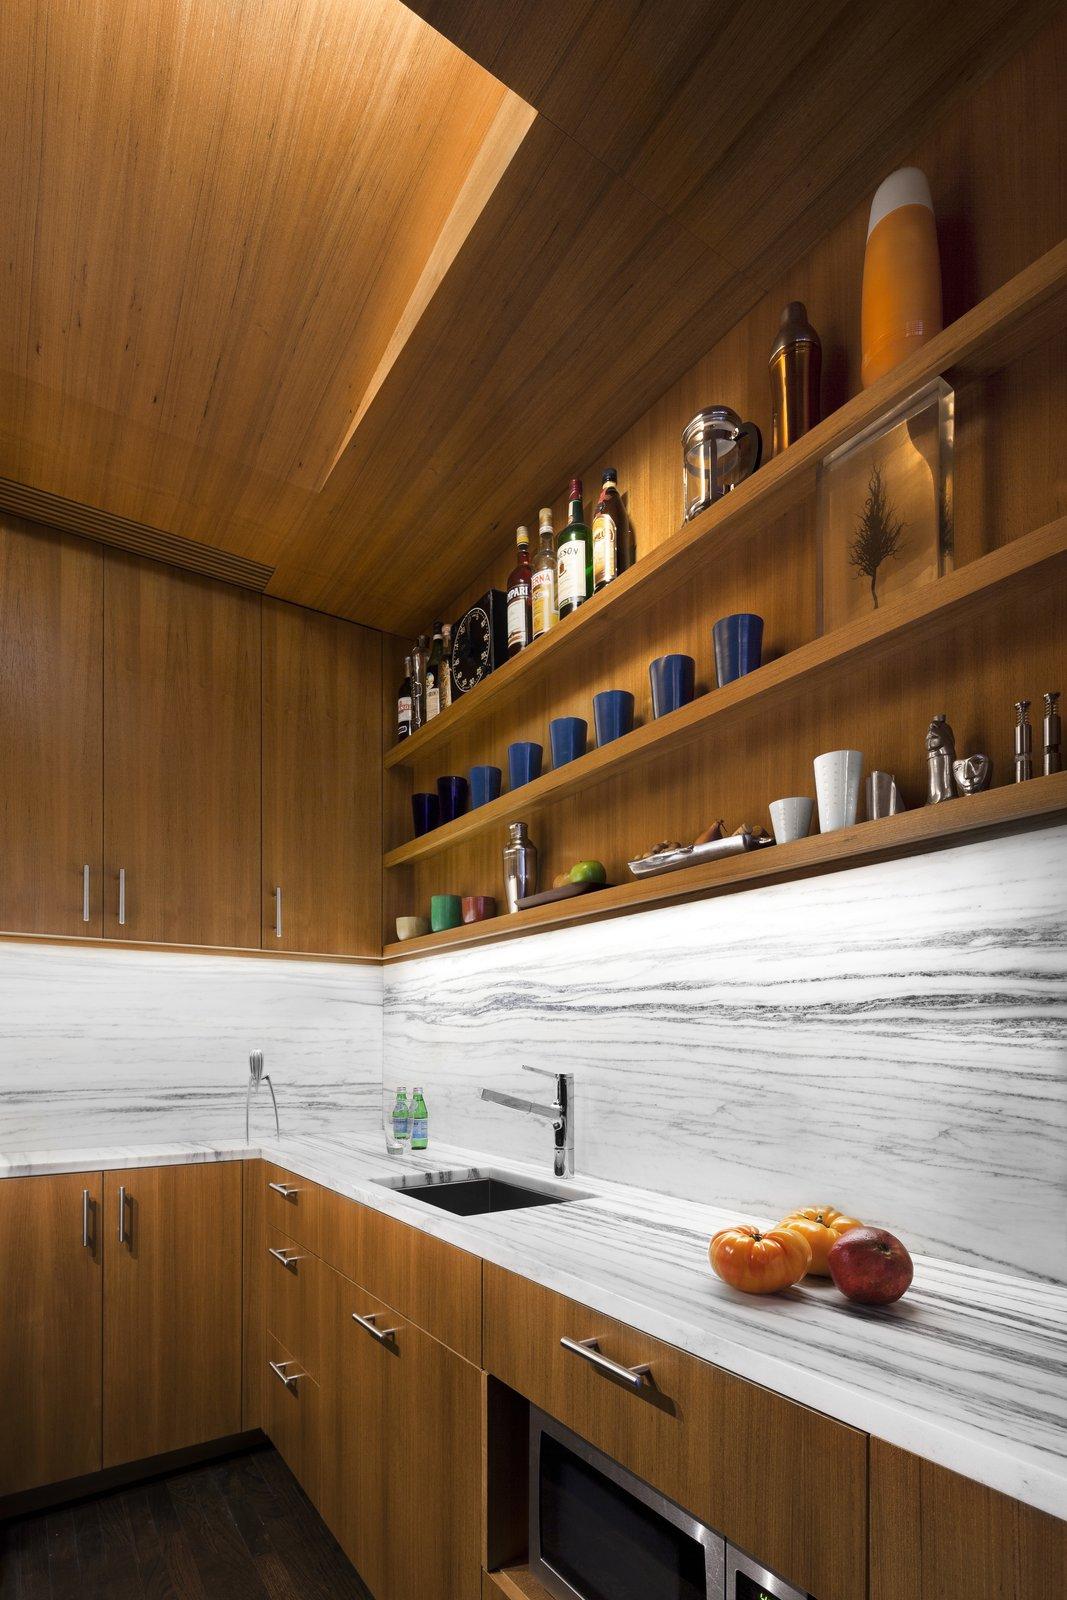 Marble kitchen backsplashes